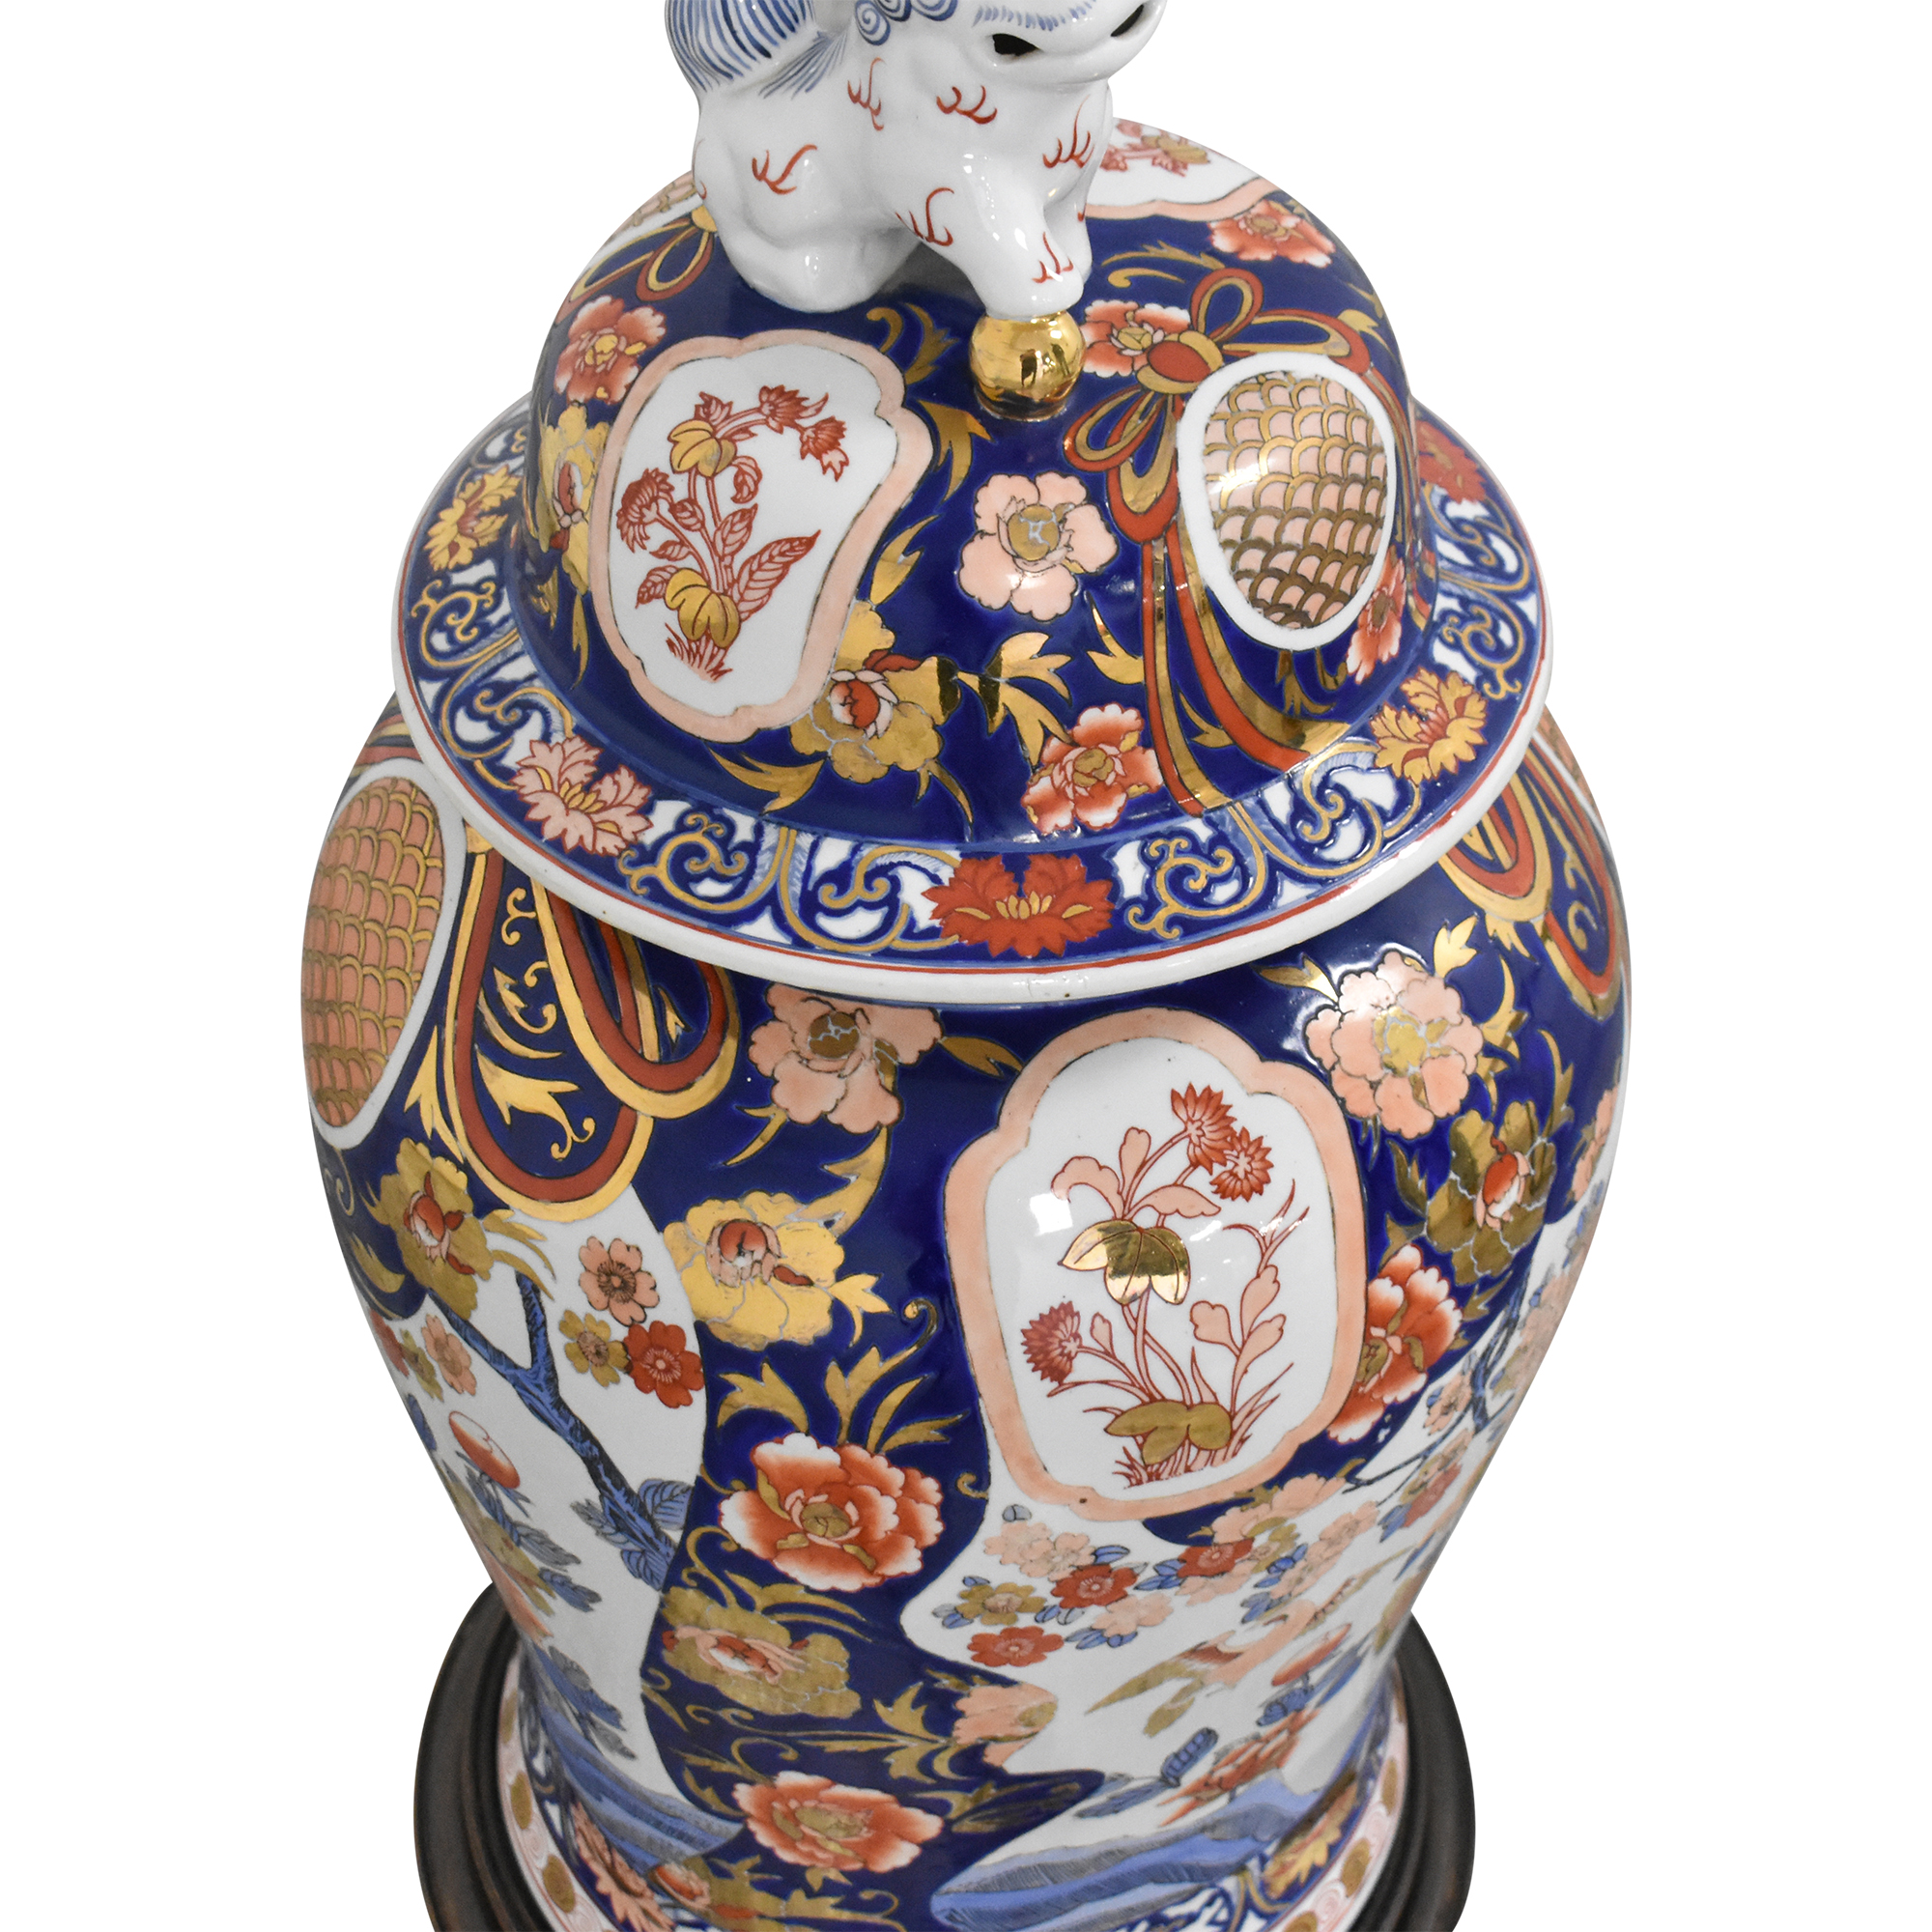 Maitland-Smith Maitland-Smith Decorative Vase discount